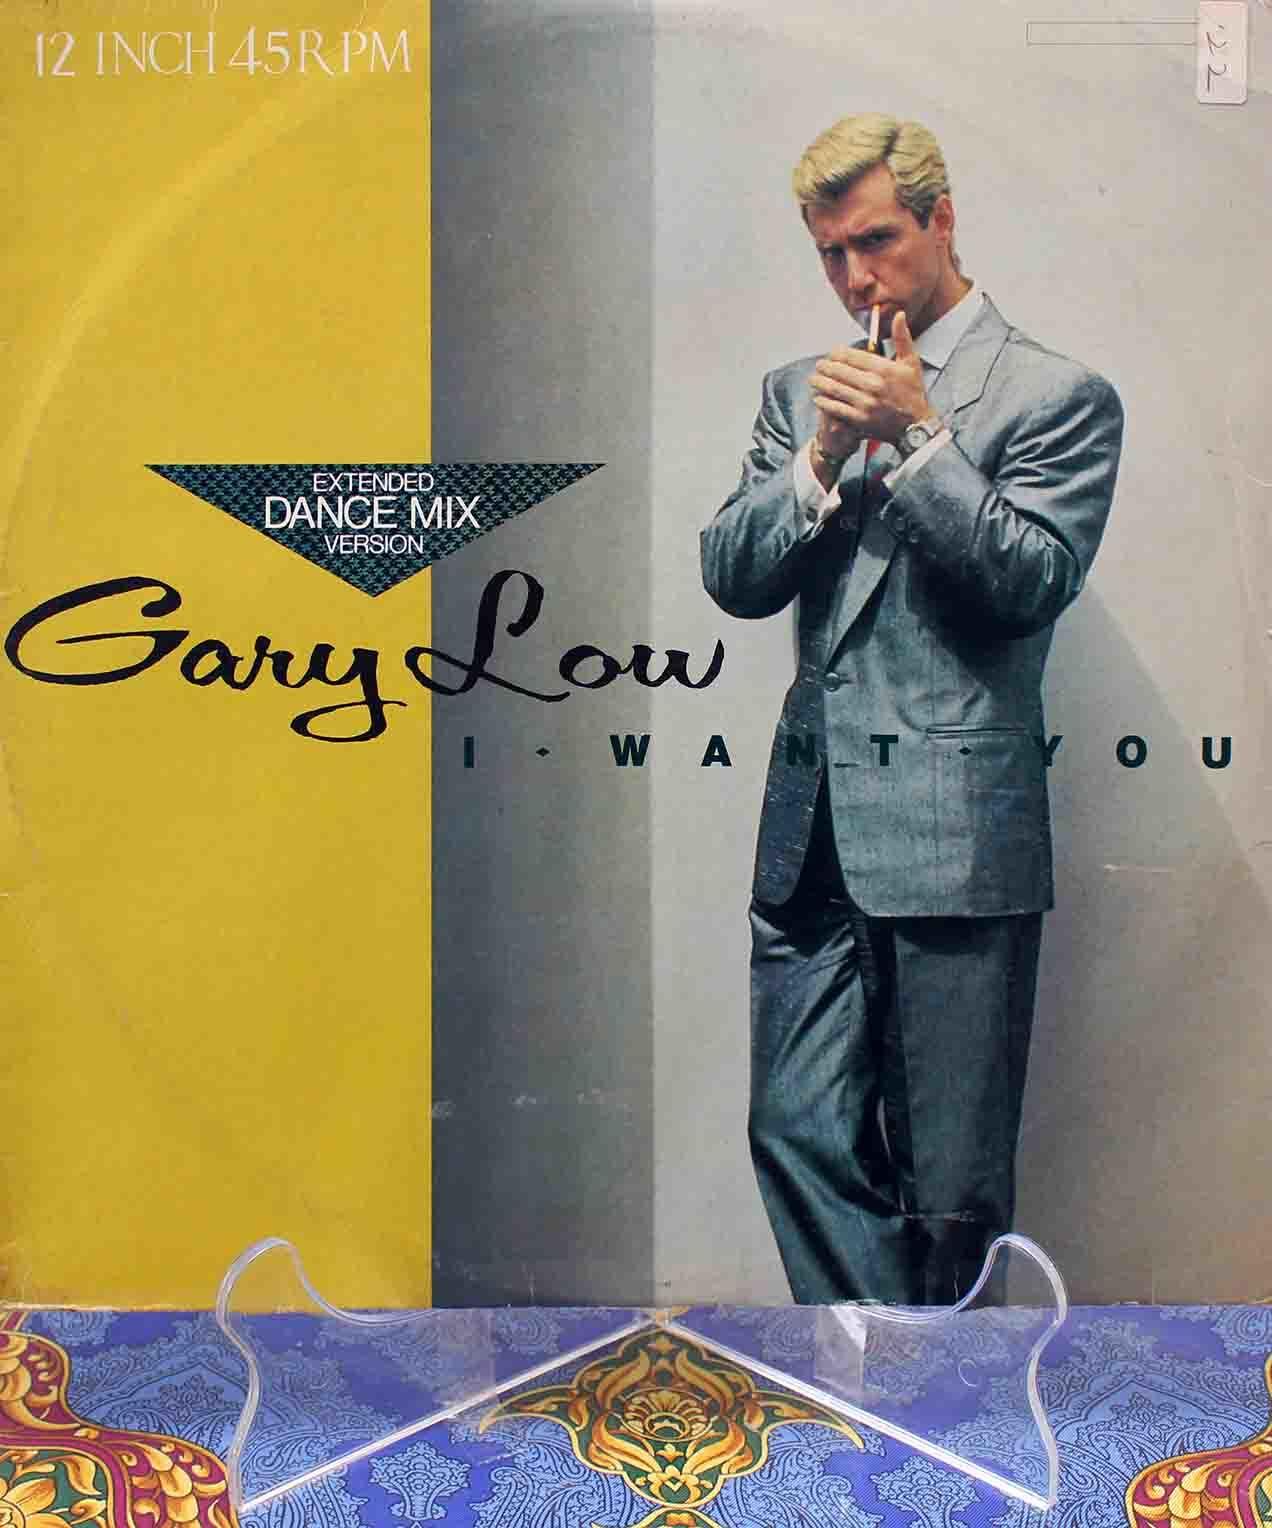 Gary Low 01